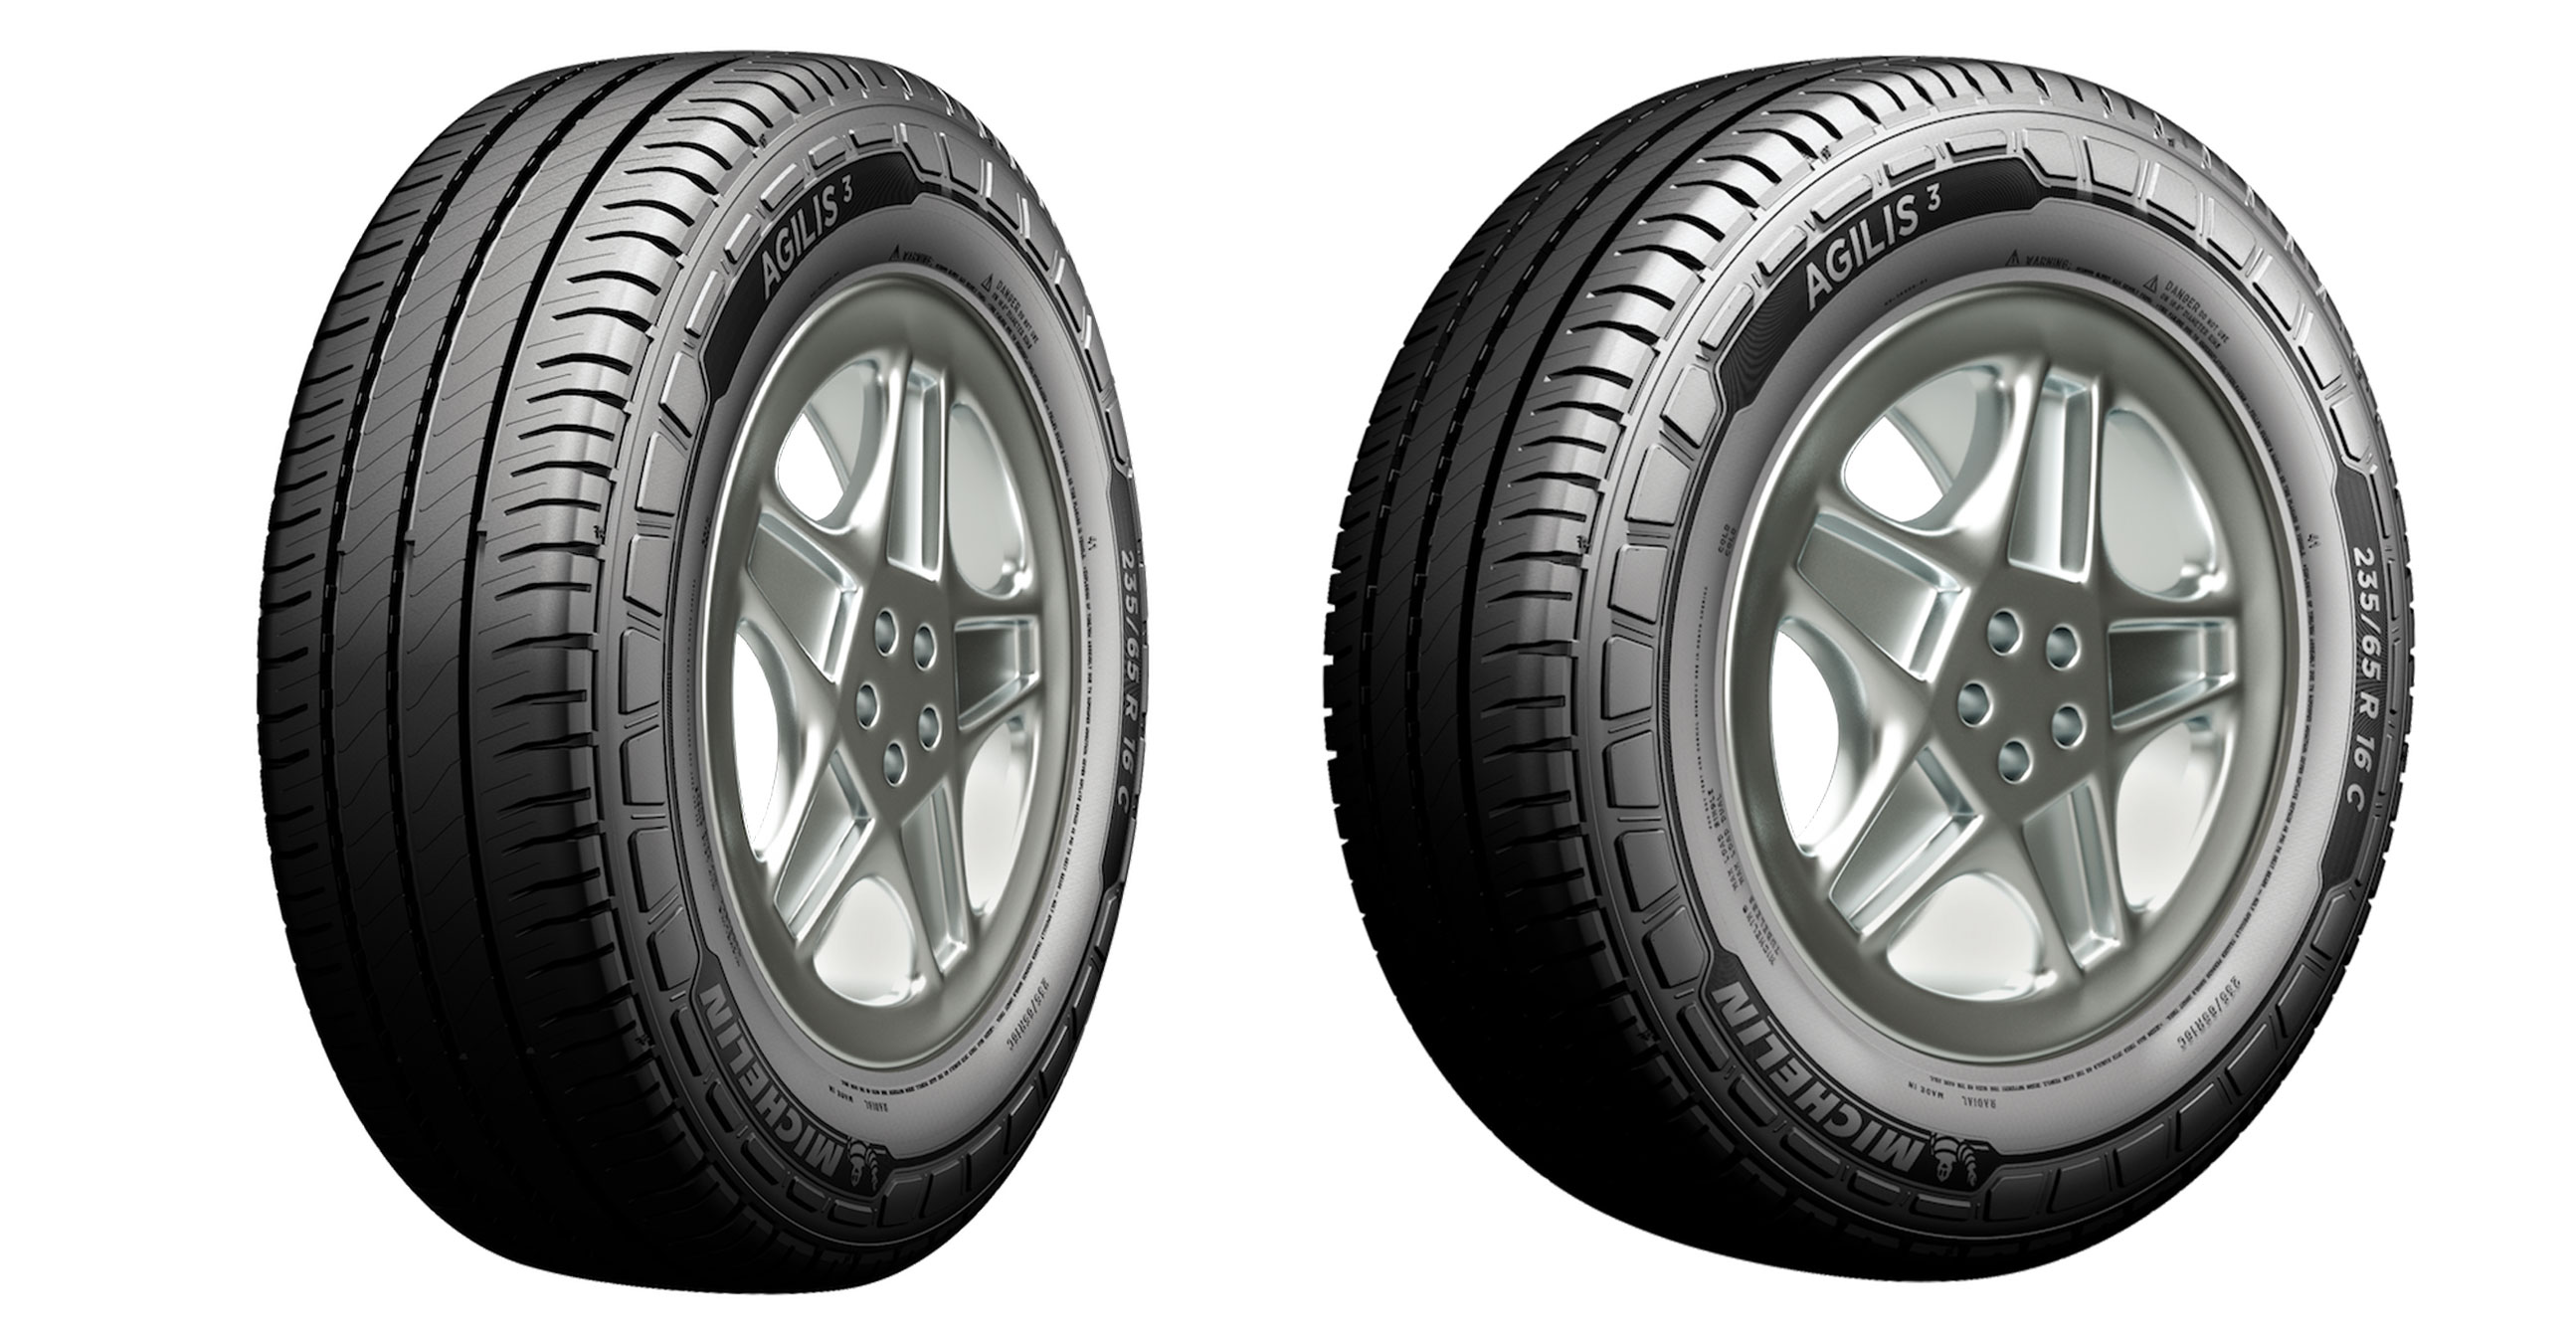 Michelin Agilis 3 Launches In The GCC